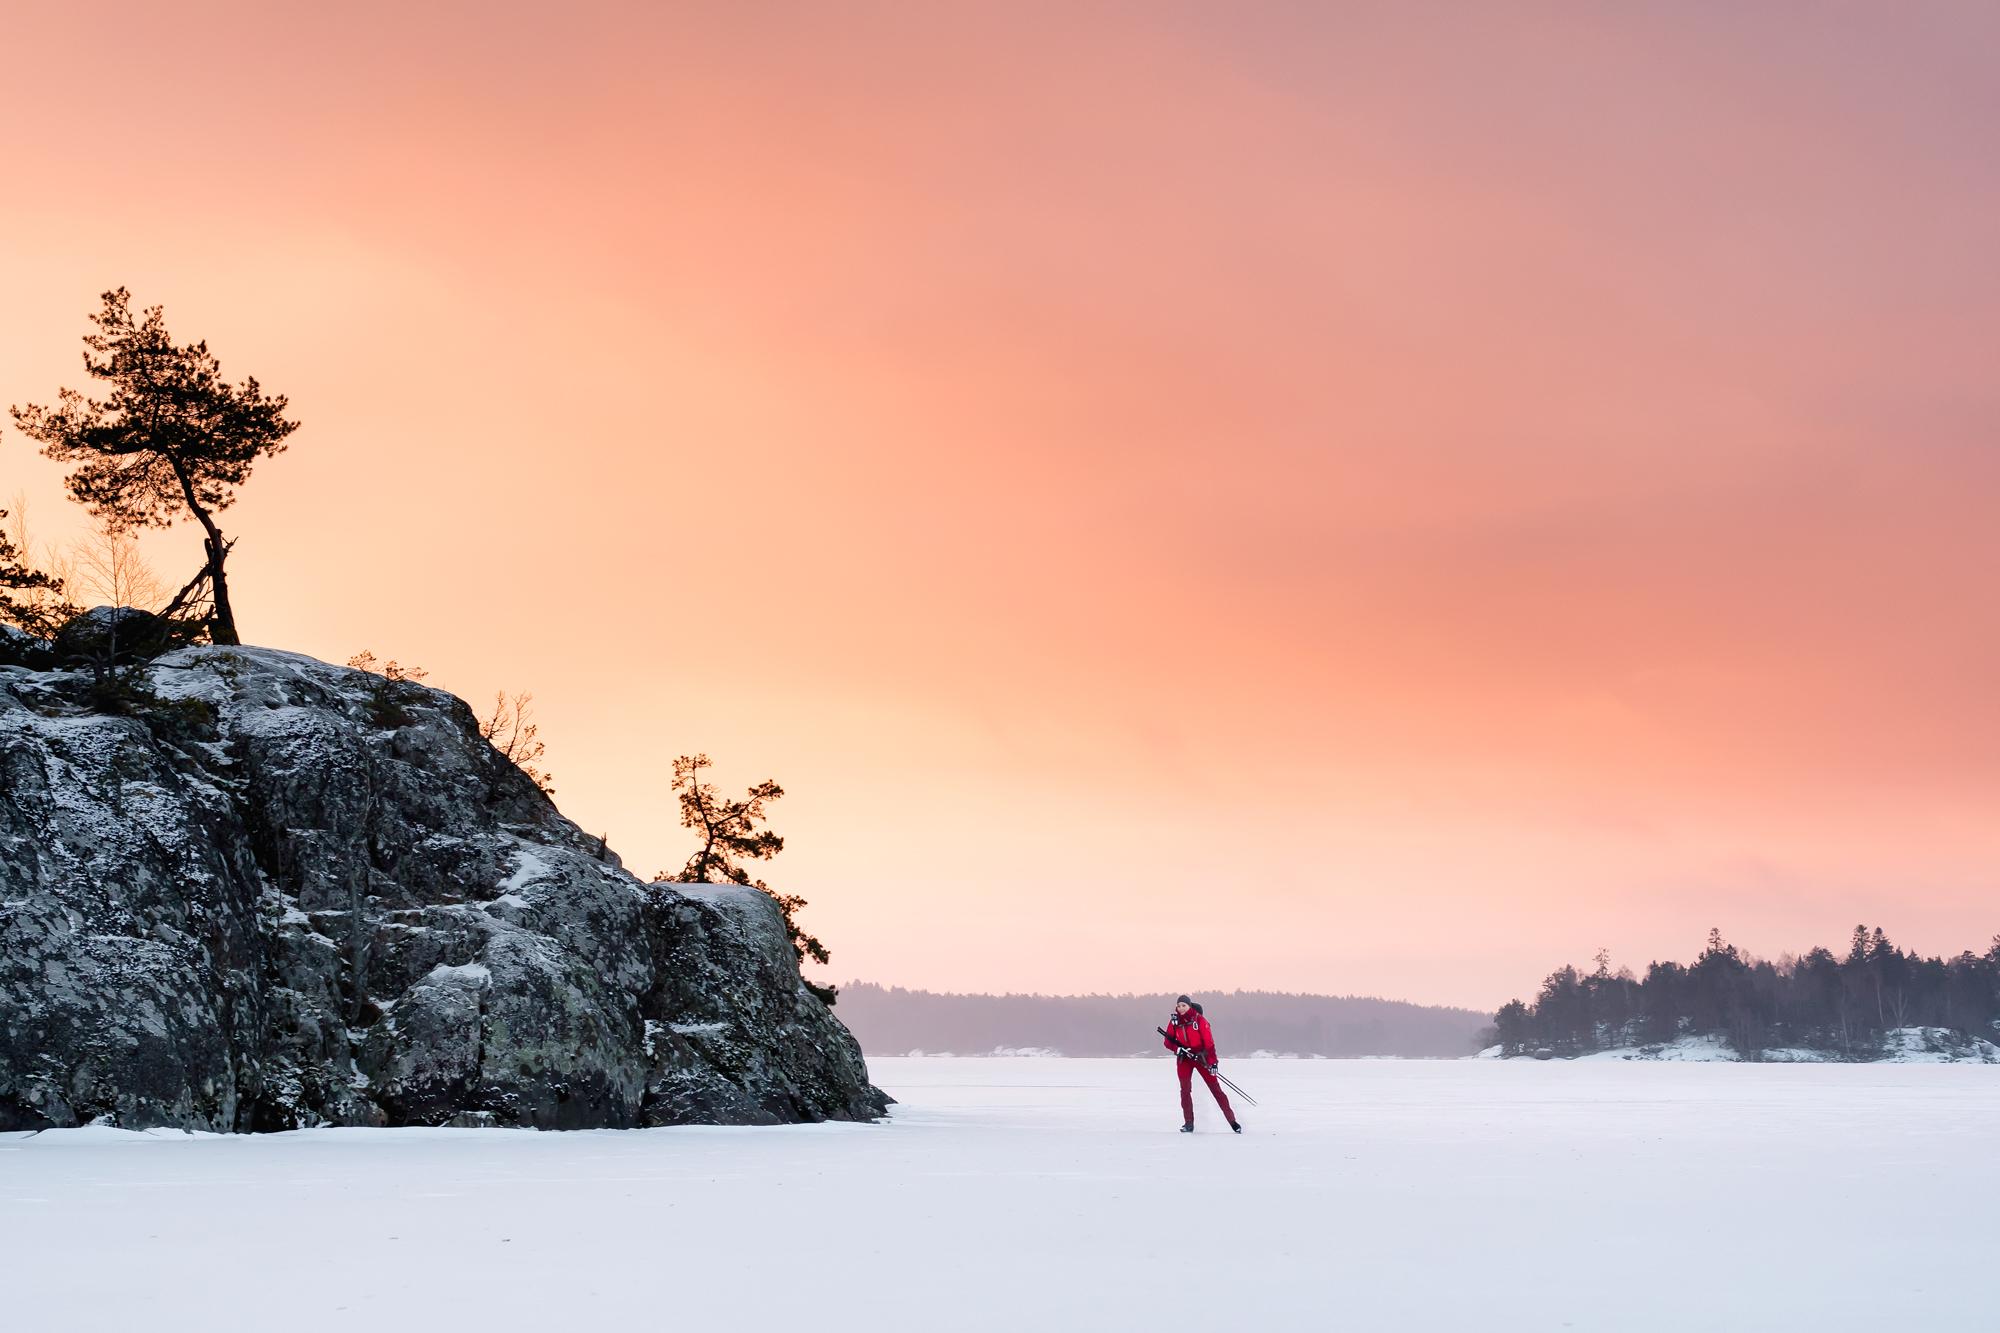 Jody-Daunton-Another-Escape-Nordic-Skating-CI1A9058.jpg